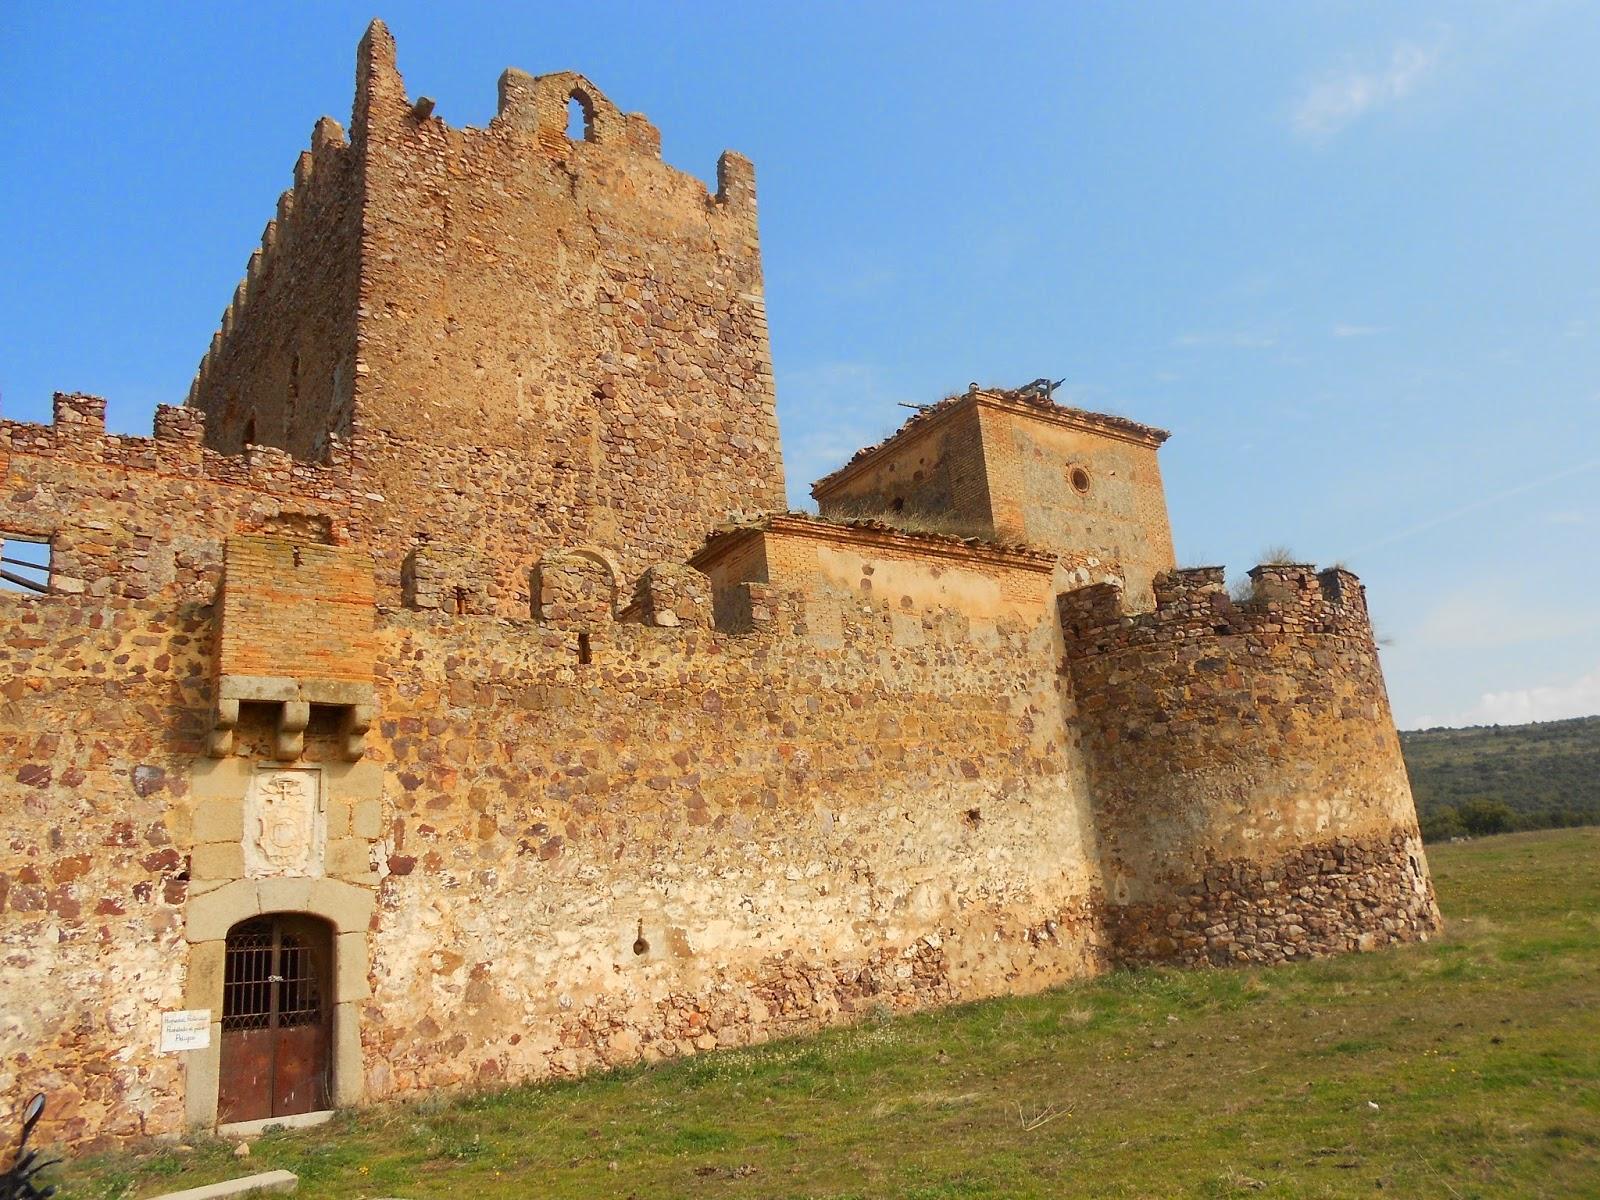 Fotos de leopoldo castillo 15